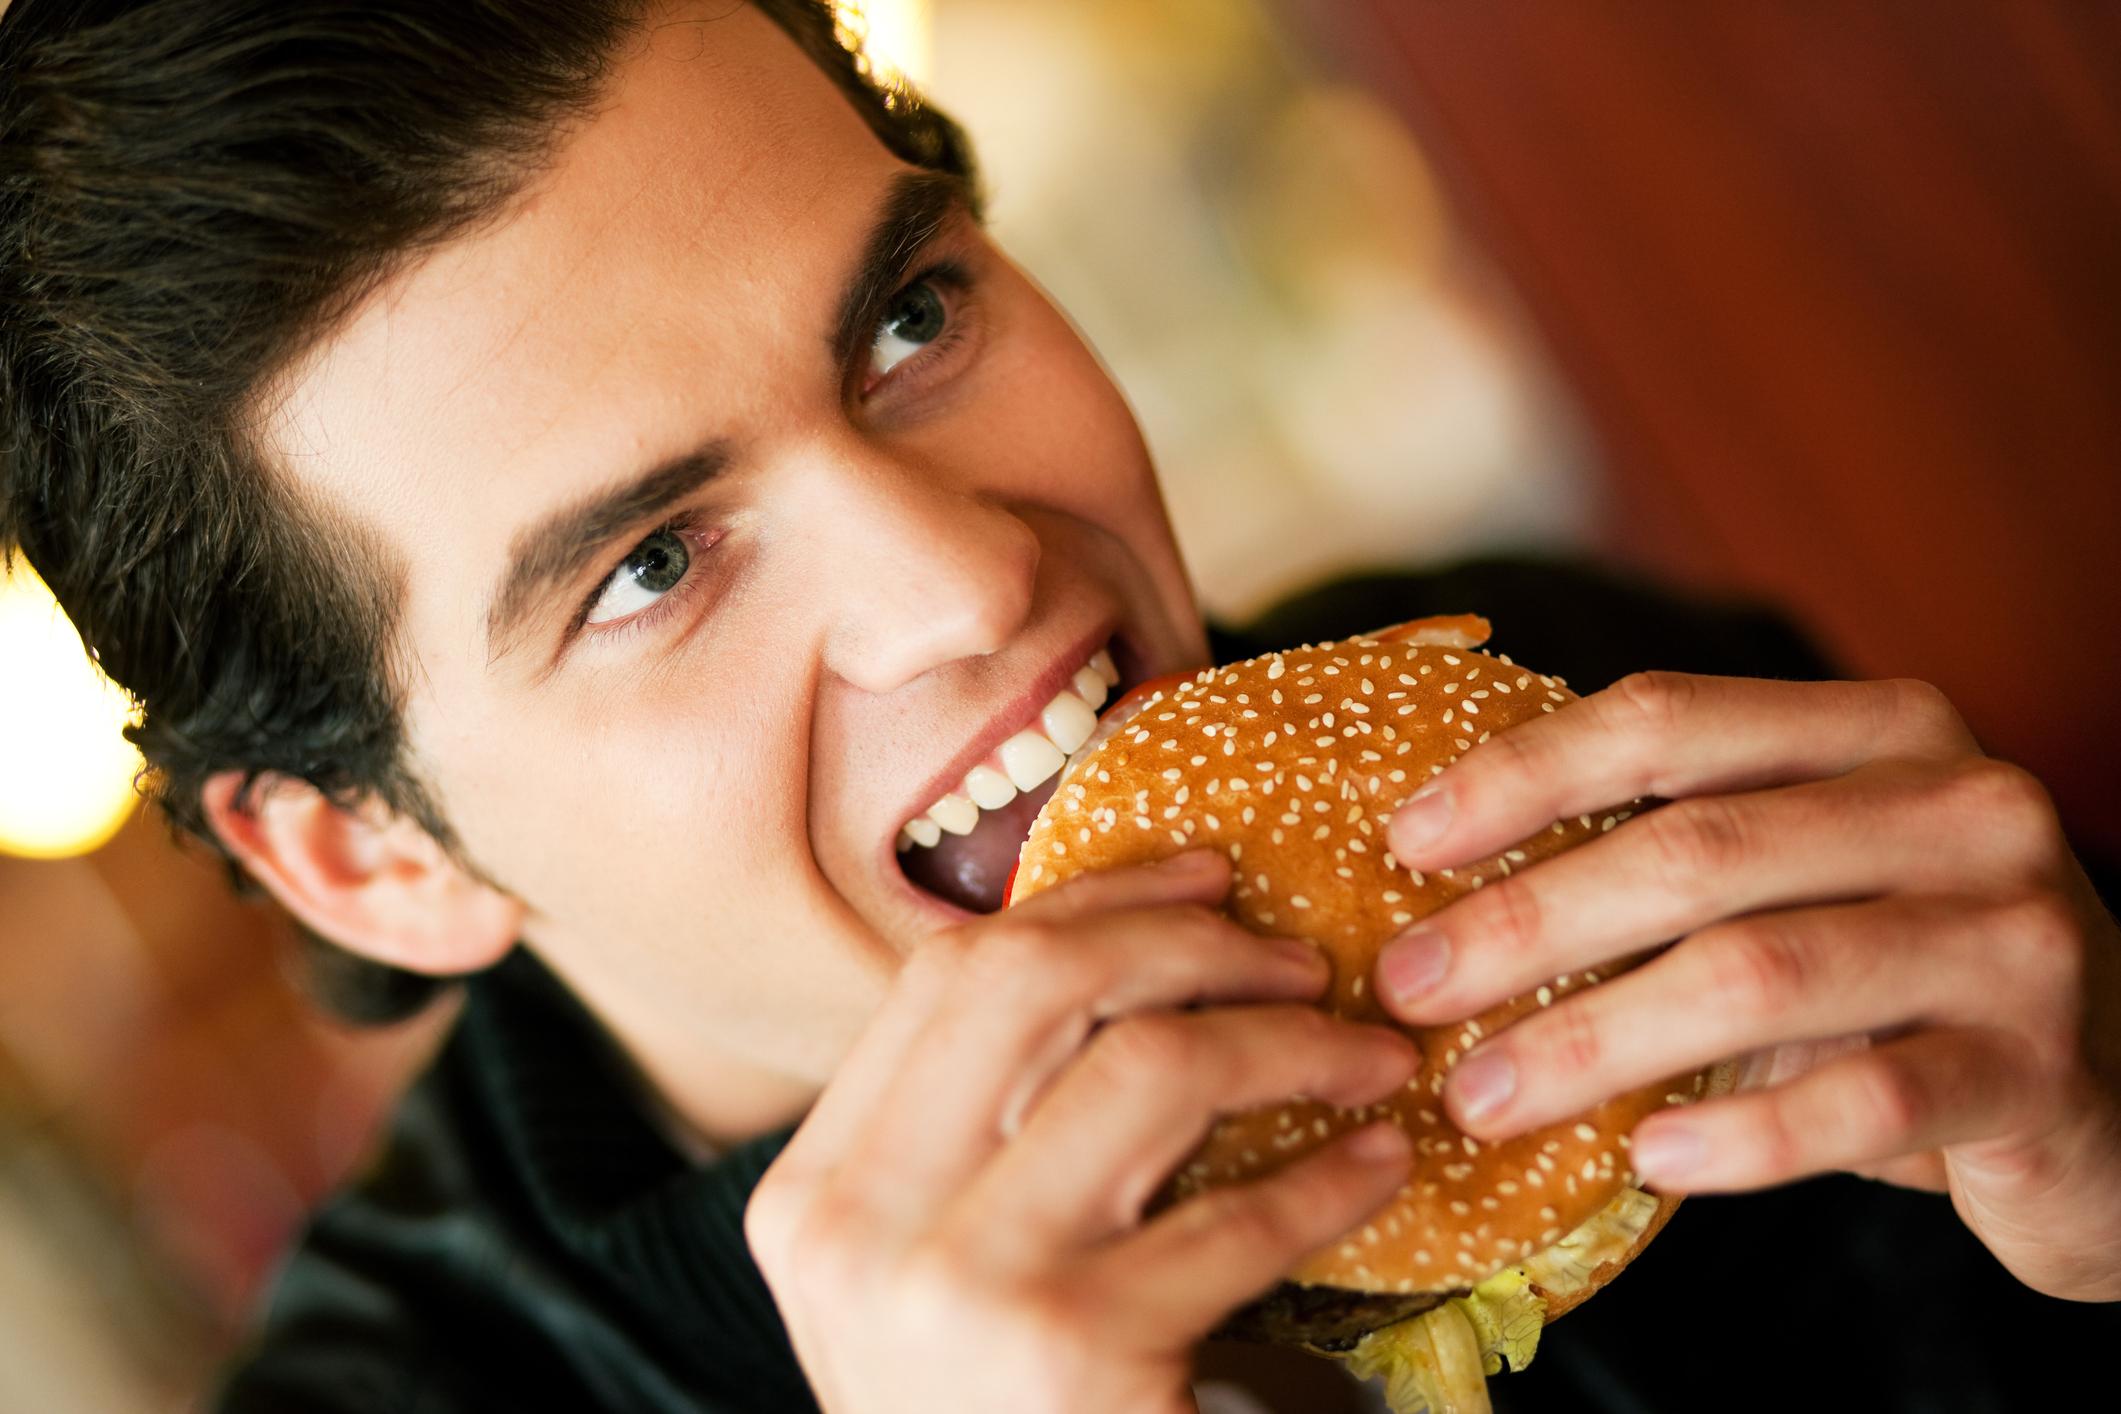 A man eating a burger.